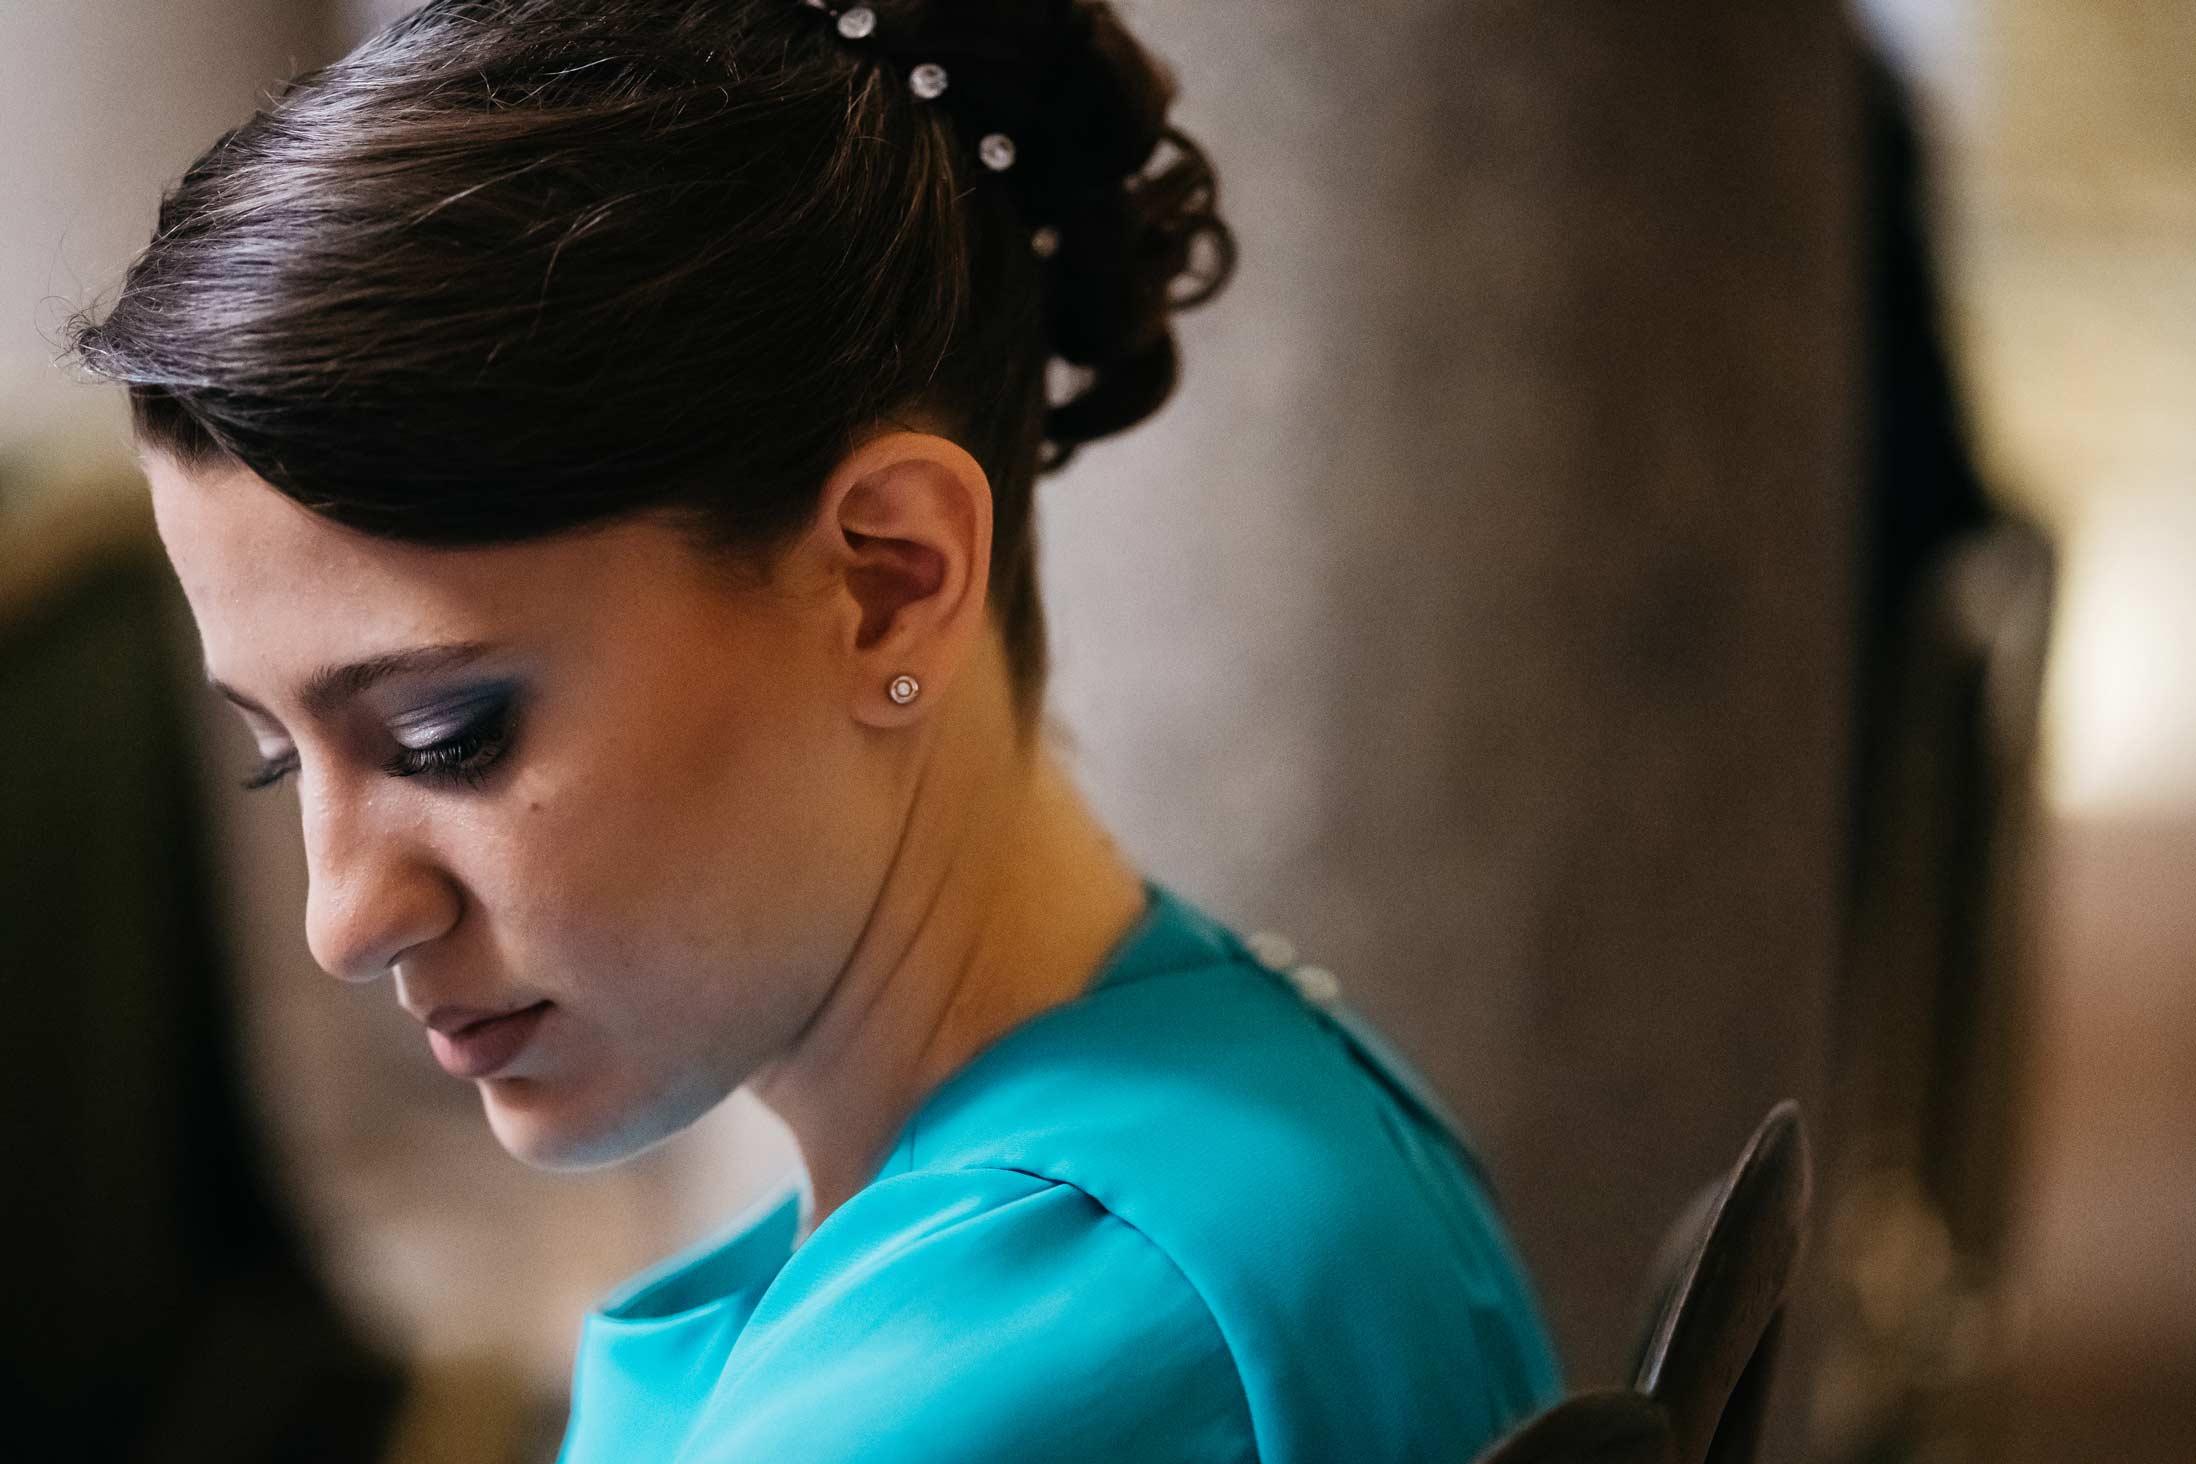 Matrimonio-Fotografo-Stile-Reportage-Roma-Cerimonia